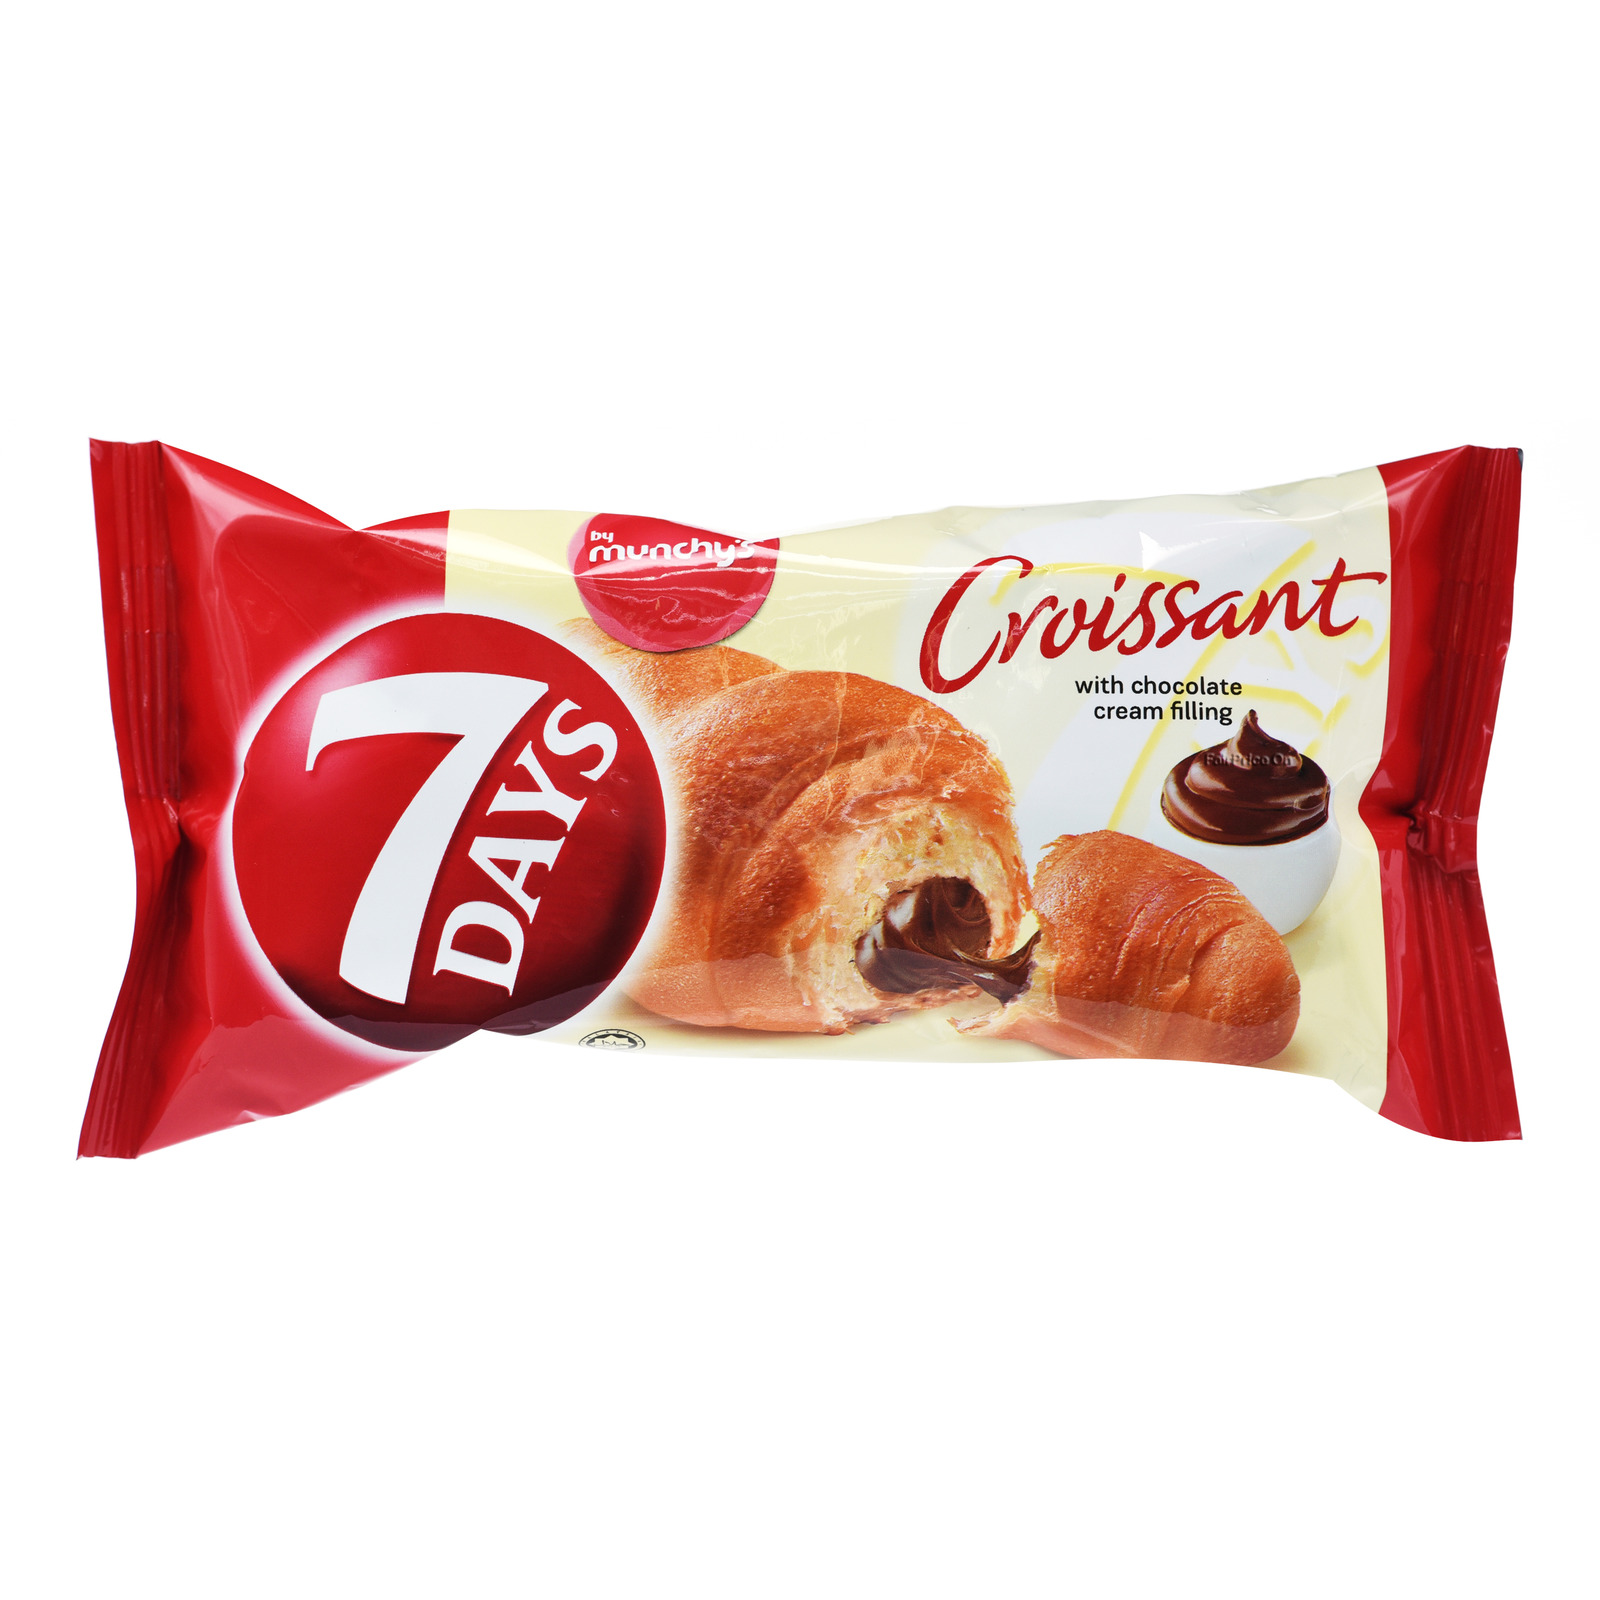 Munchy's 7 Days Croissant Cream Bun - Chocolate